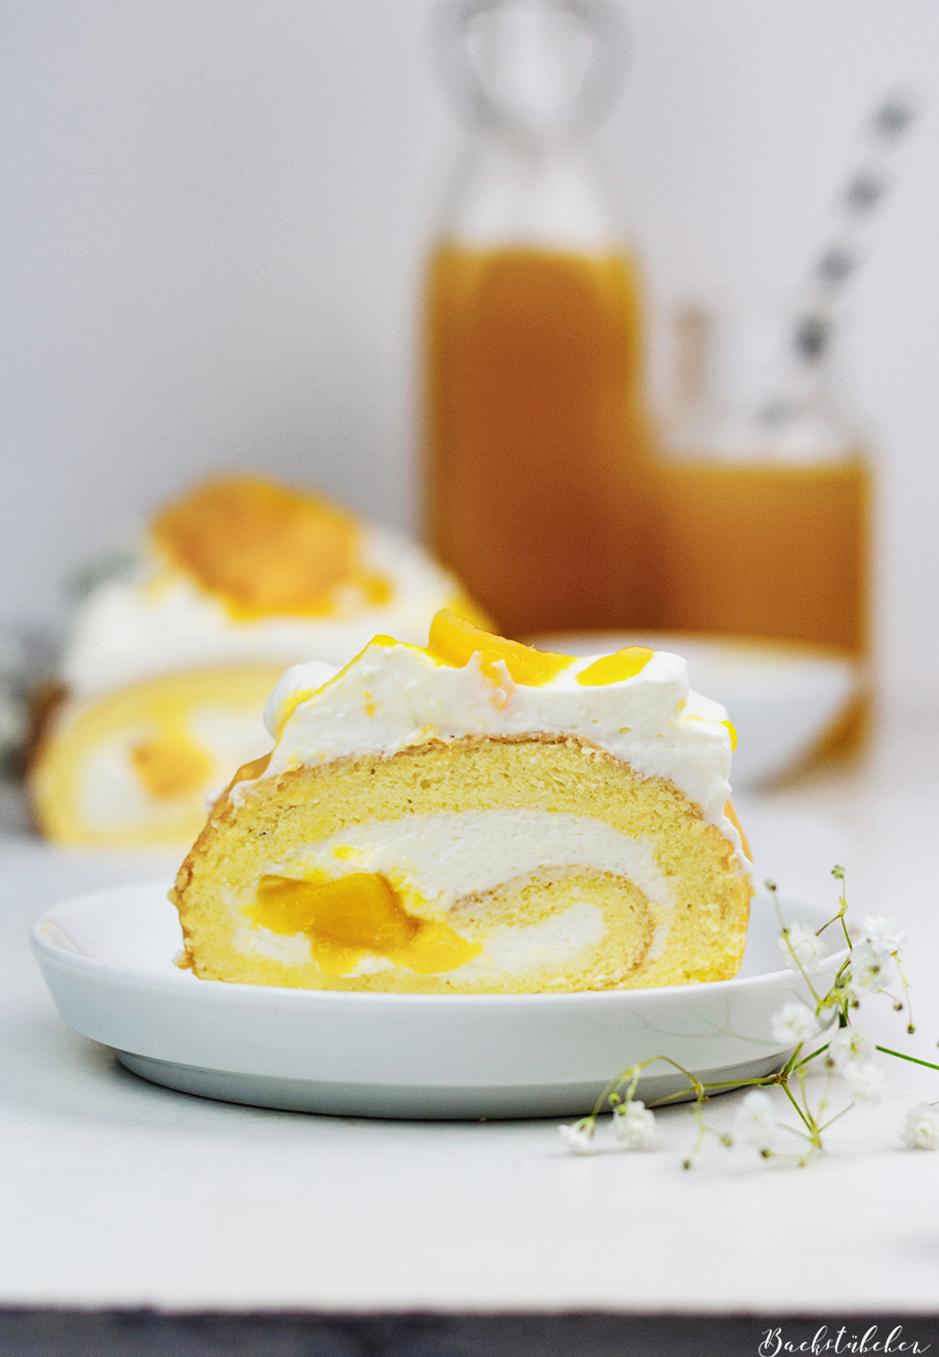 mango-biskuitrolle7.1.jpg